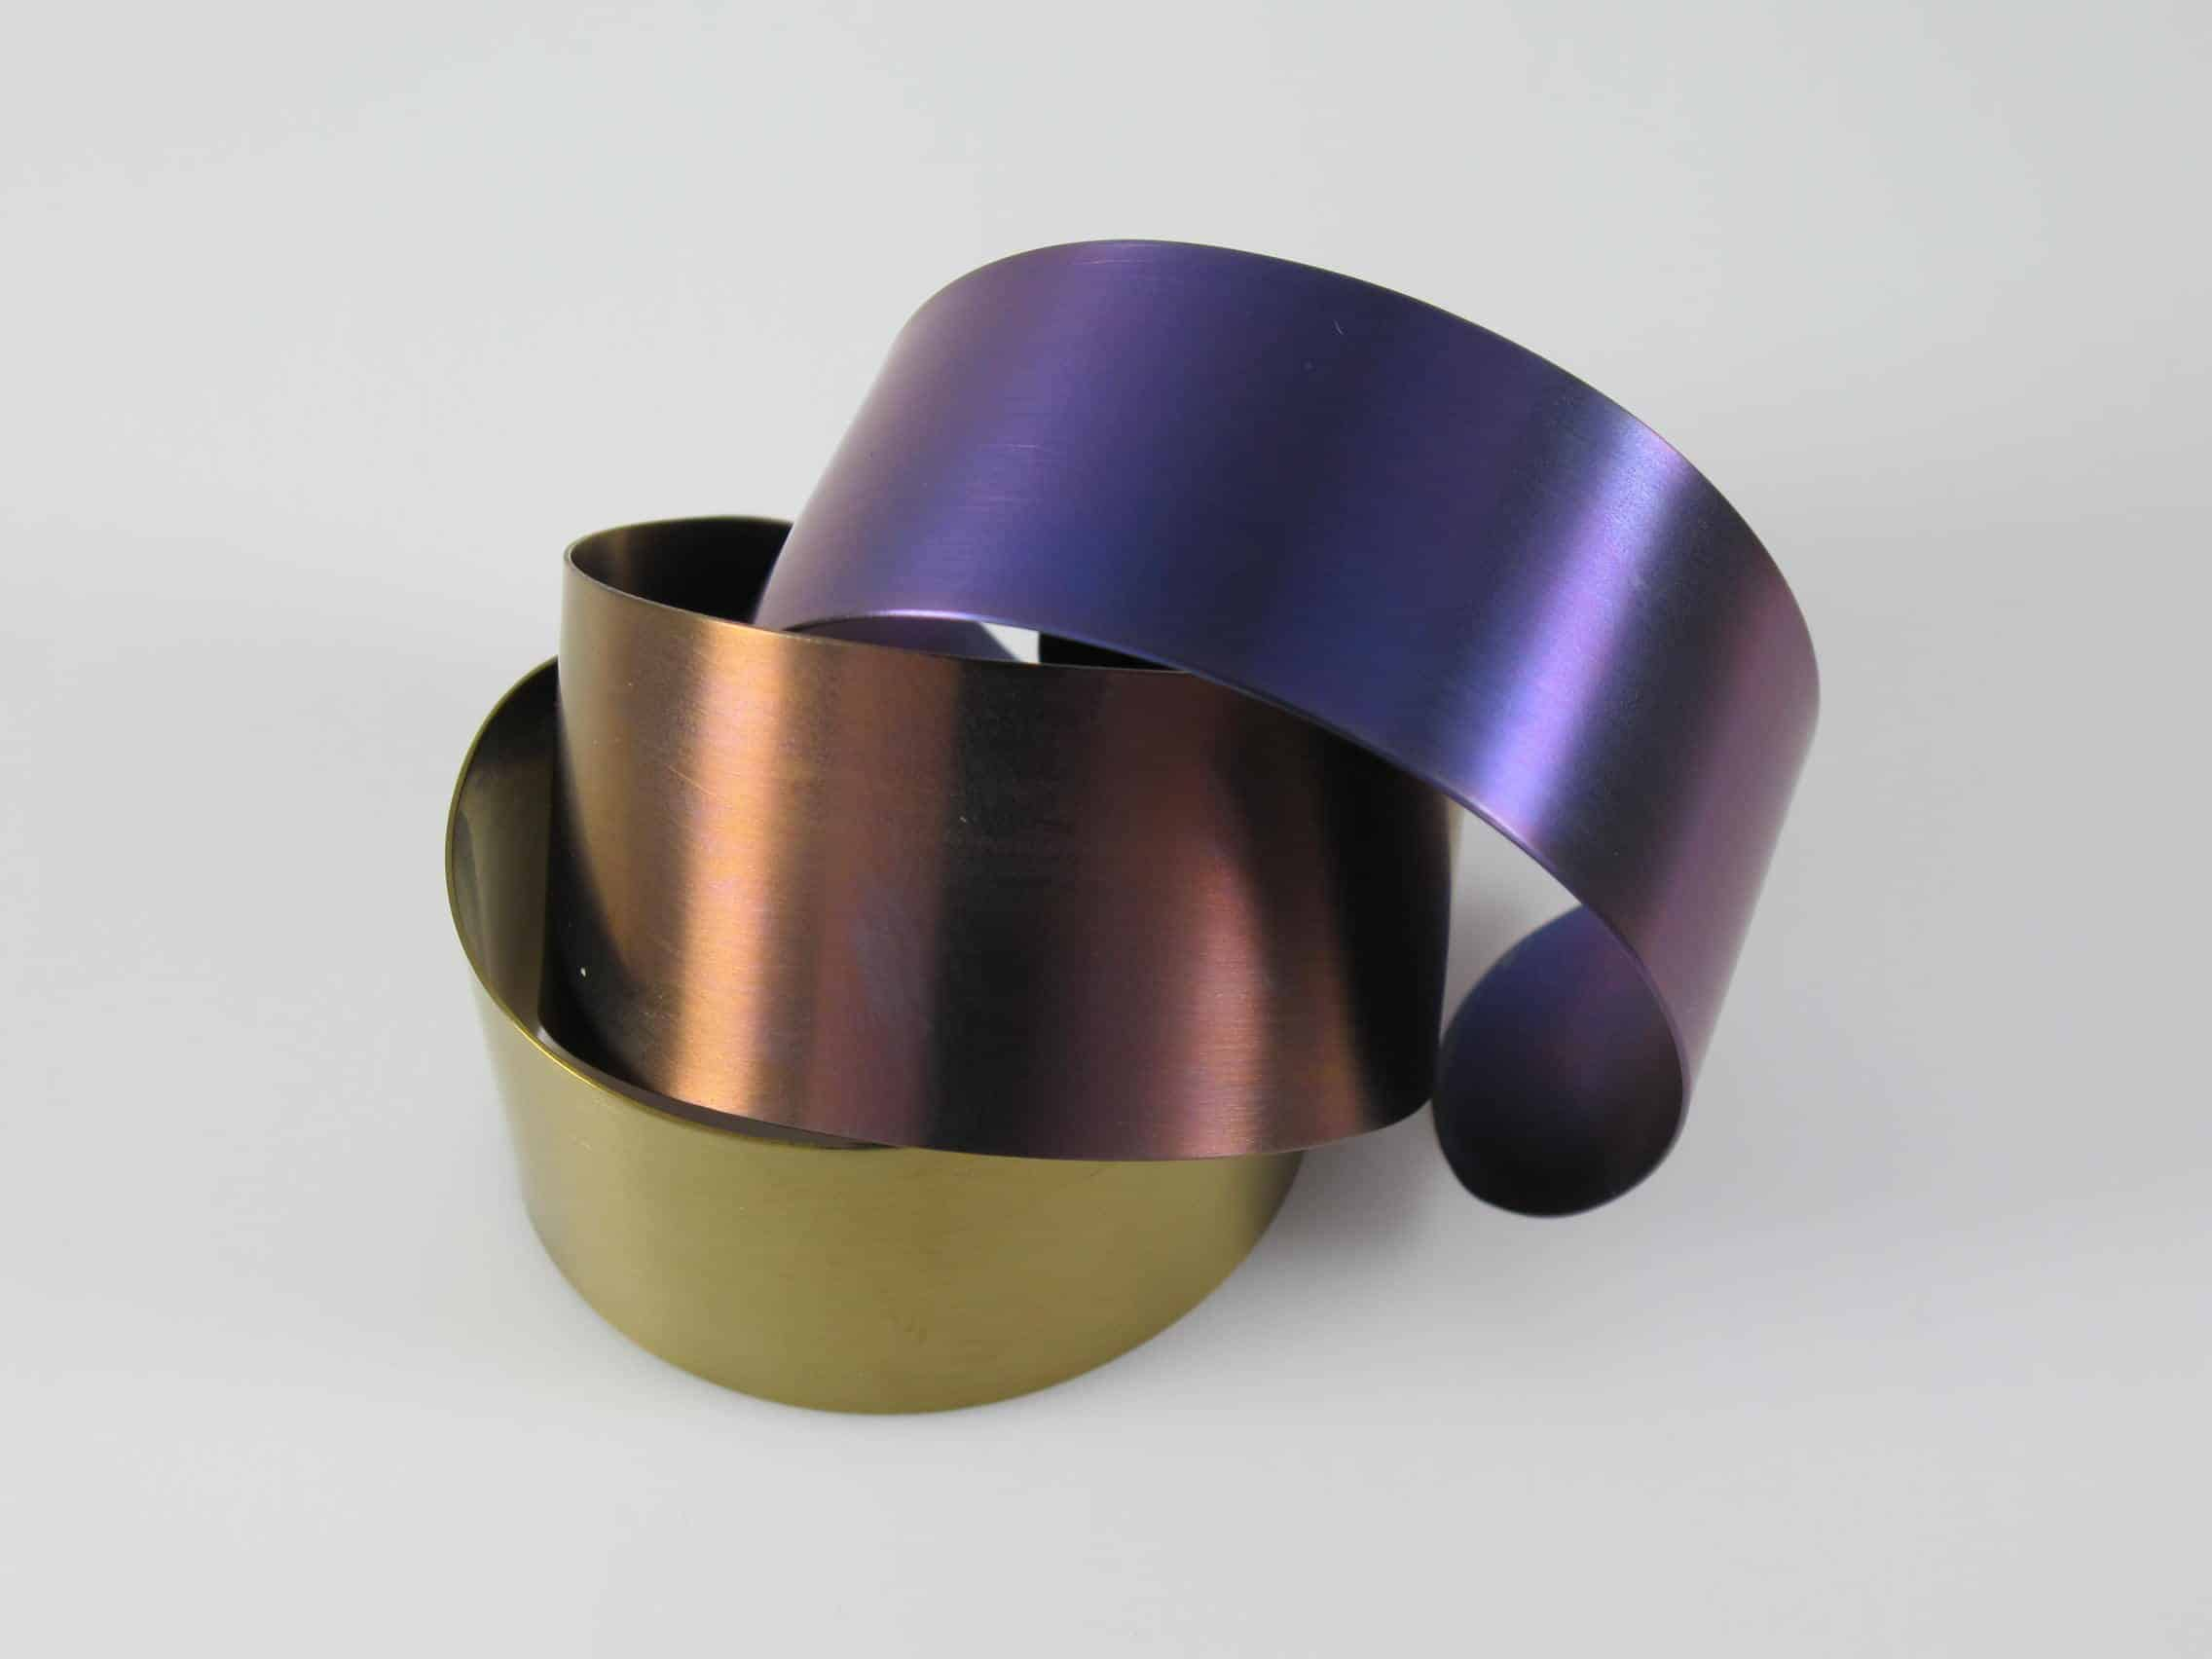 Titanium armbanden gekleurd